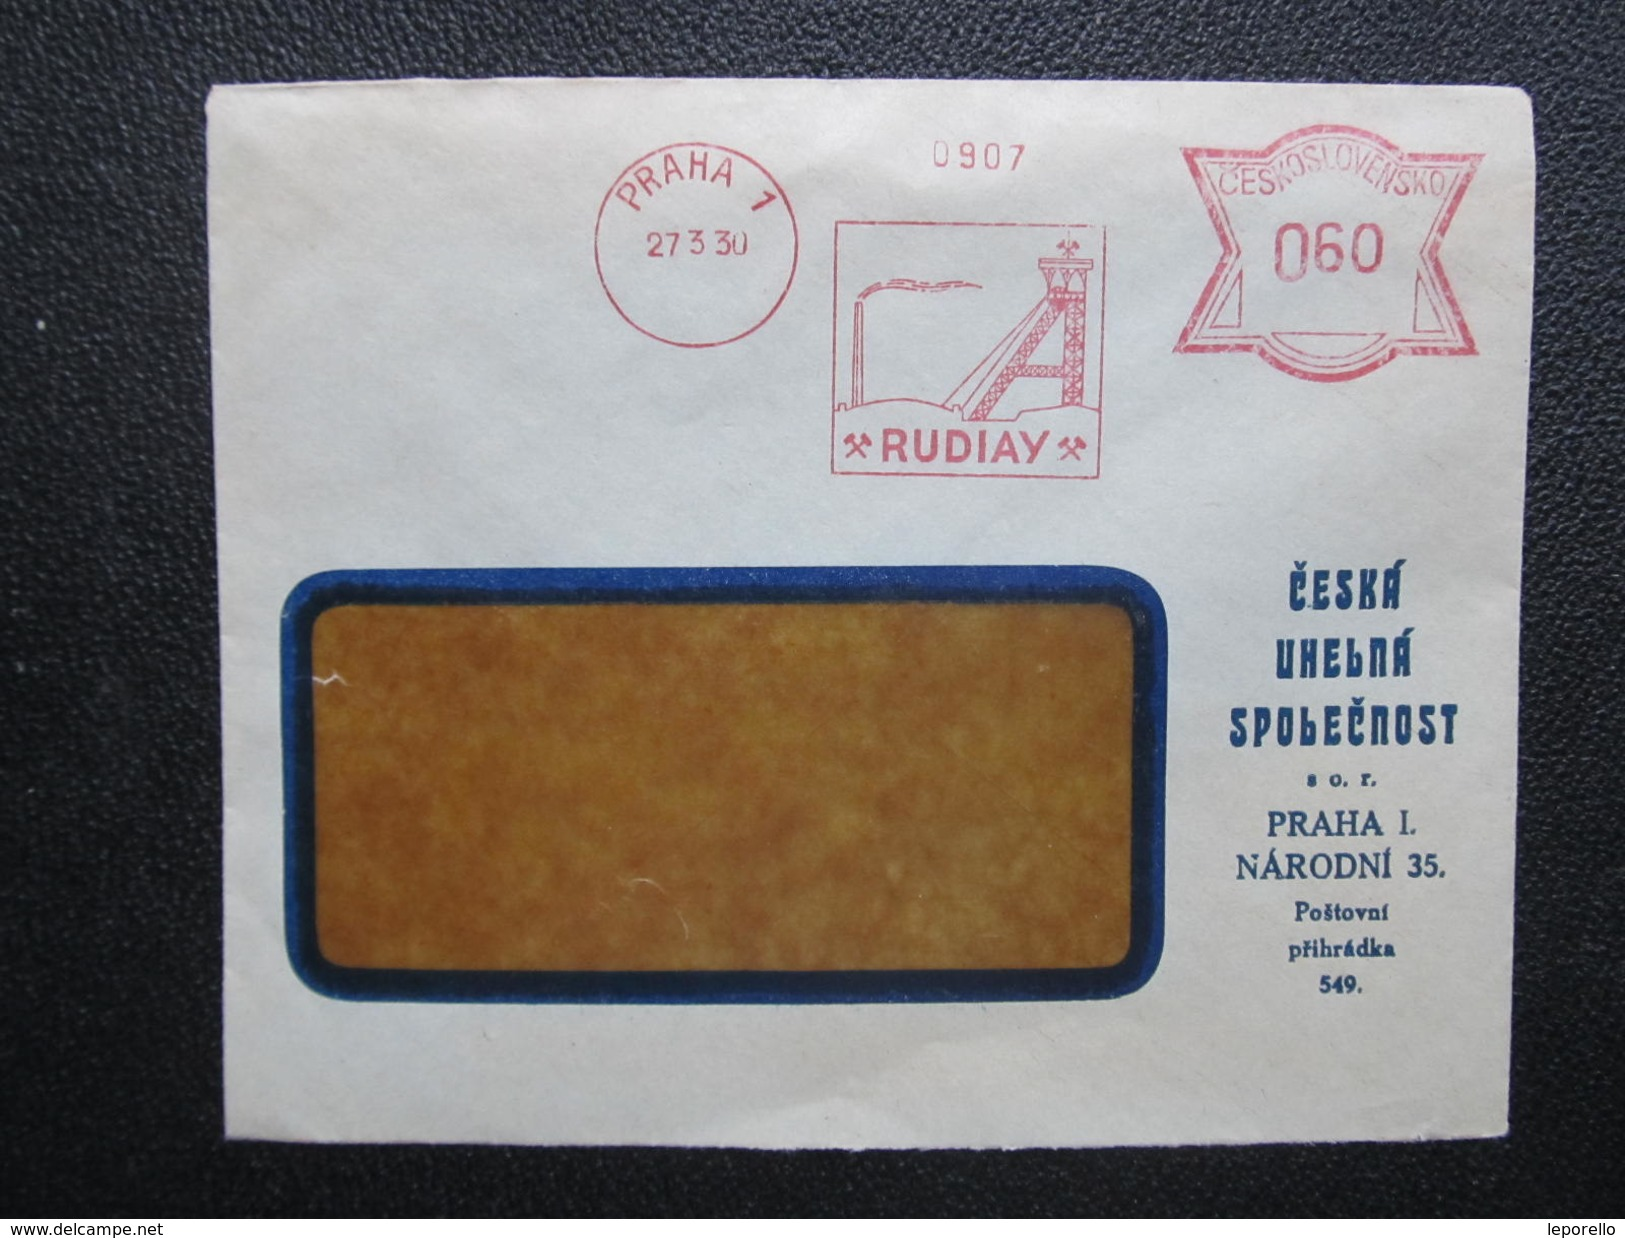 BRIEF Praha Rudiay Bergwerk Kohle 1930 Frankotype Freistempel Postfreistempel  /// O5015 - Tschechoslowakei/CSSR